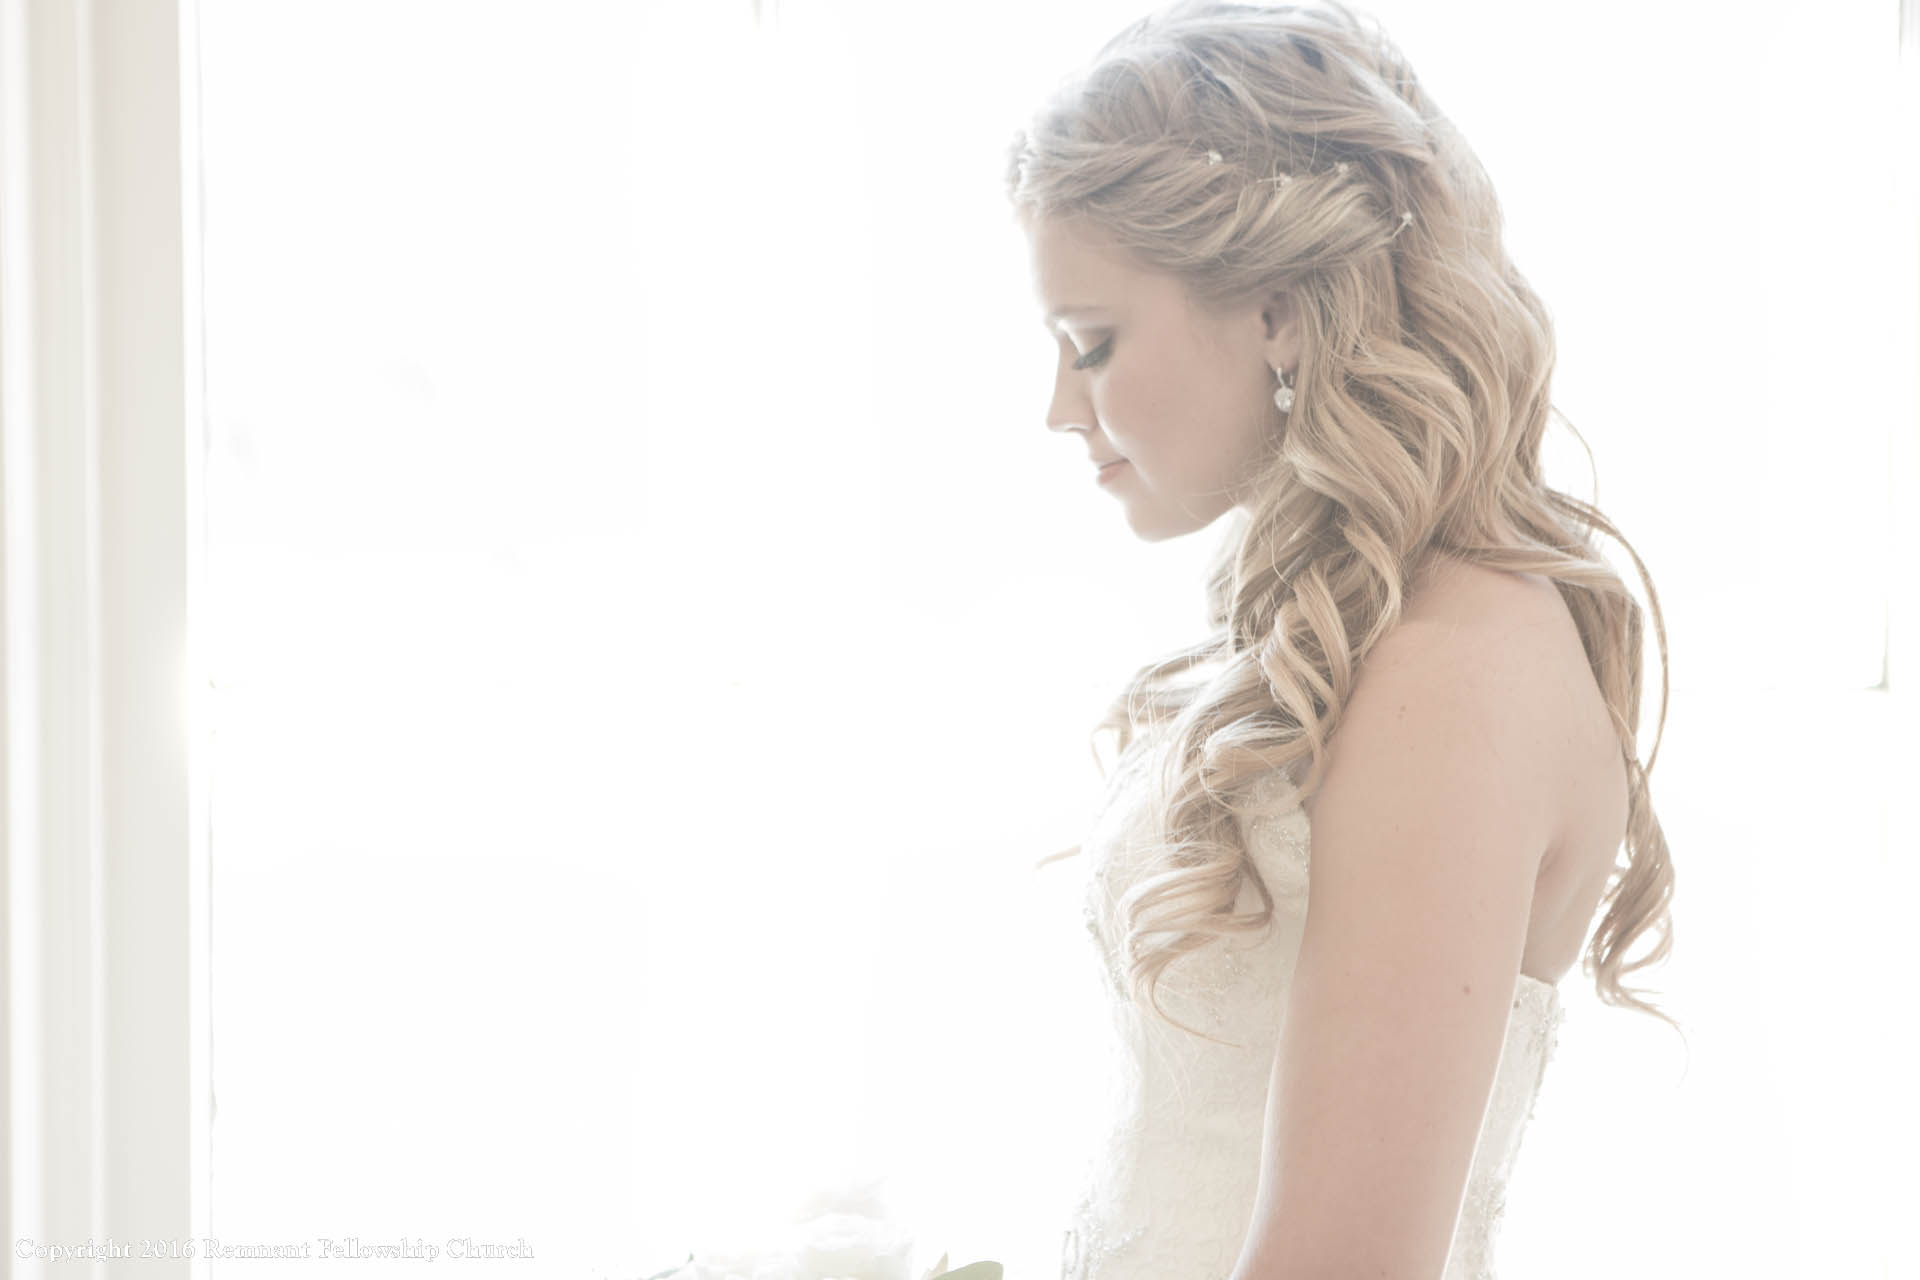 Remnant-Fellowship-Martin-Jost-Wedding-bride-hair